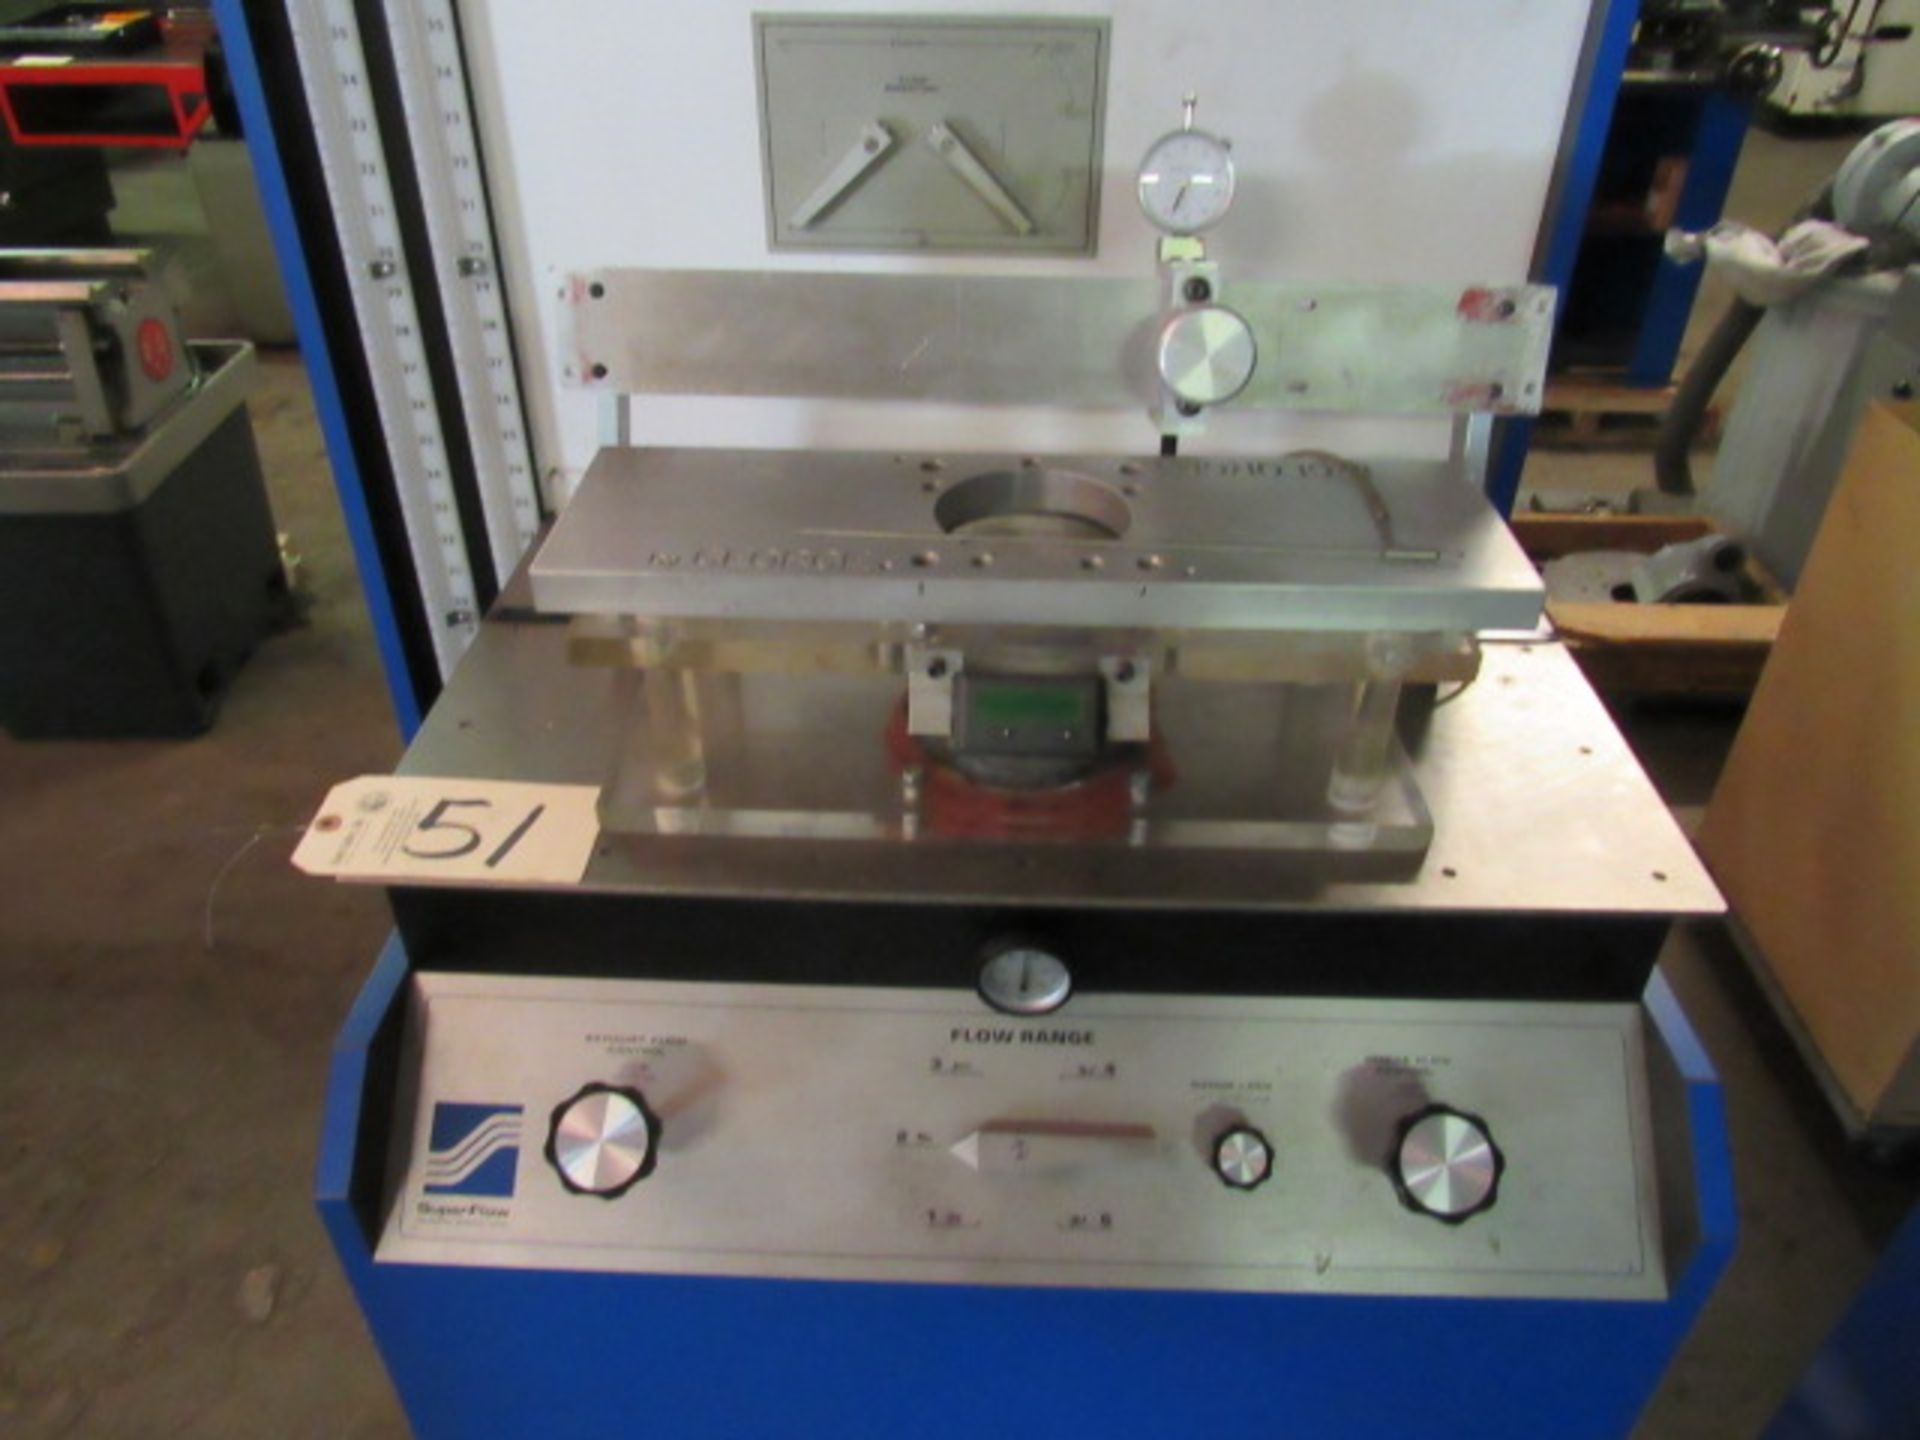 Lot 51 - Superflow Model SF-600 Test System